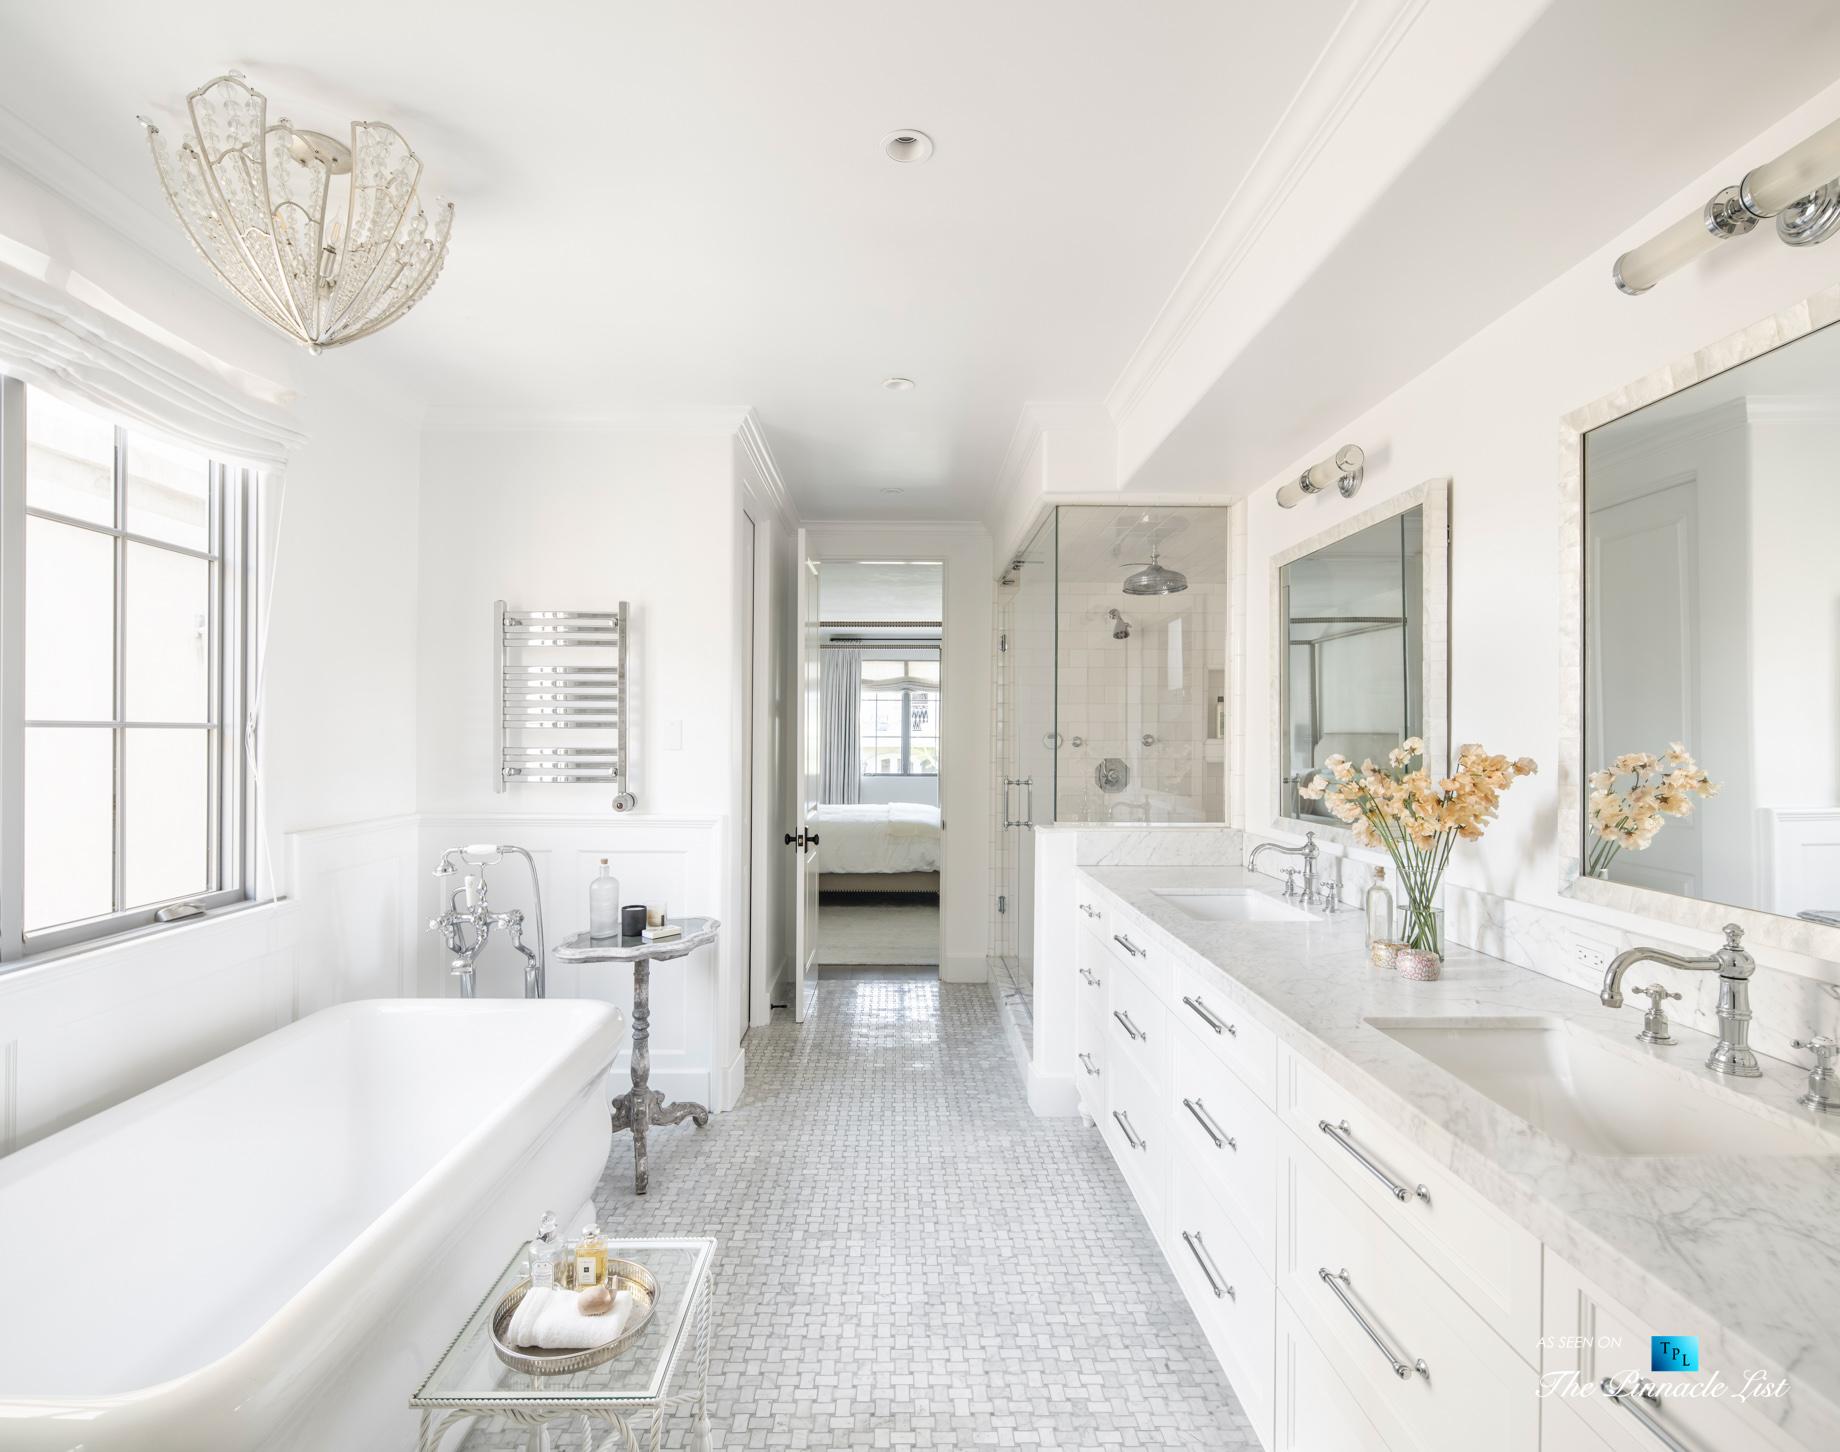 Exquisite Luxury Walk Street Home - 220 8th St, Manhattan Beach, CA, USA - Master Bathroom